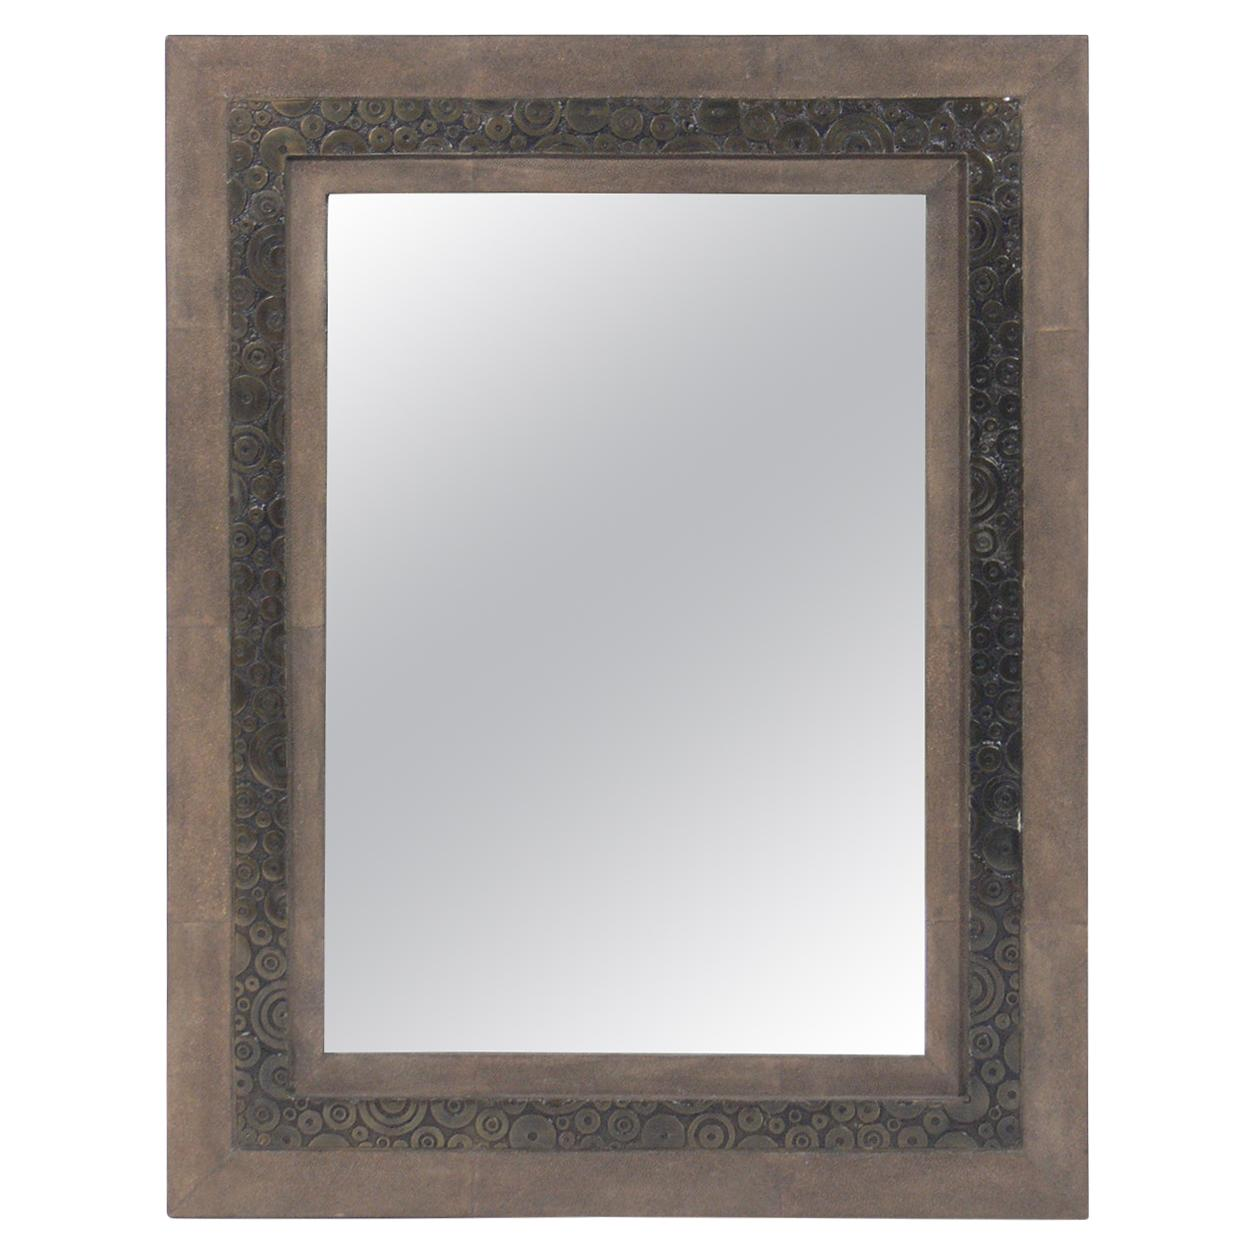 Shagreen and Bronze Mirror by R & Y Augousti